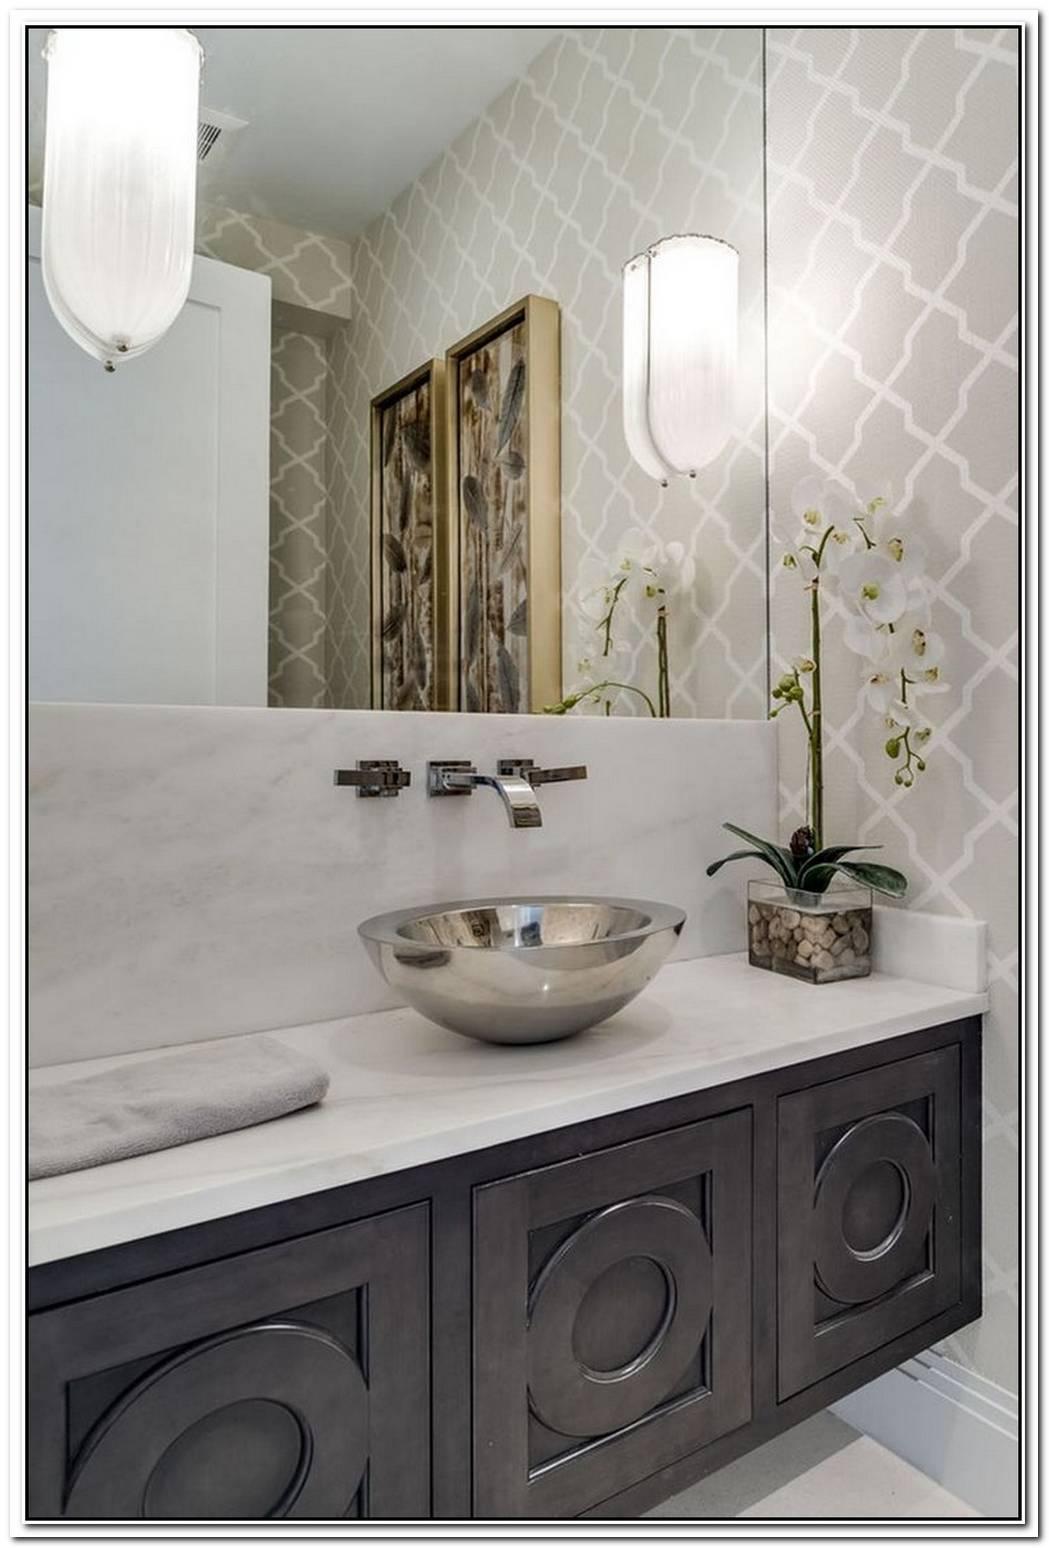 Fresh Spring Bathroom Collection By Sanindusa